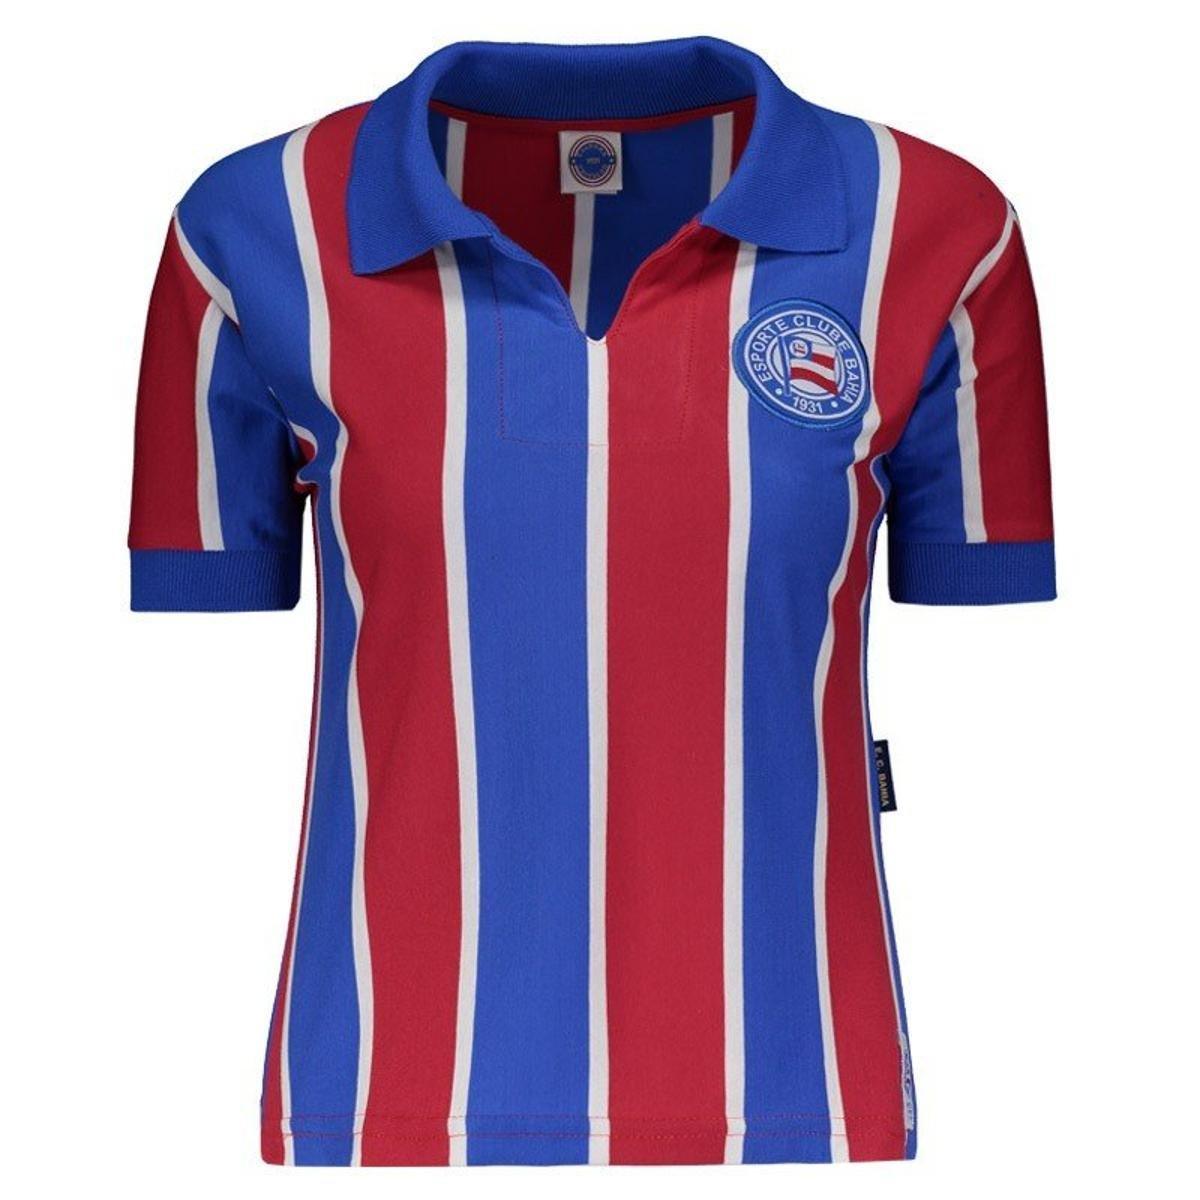 Camisa Bahia 1959 Feminina - Azul - Compre Agora  dca73d89842